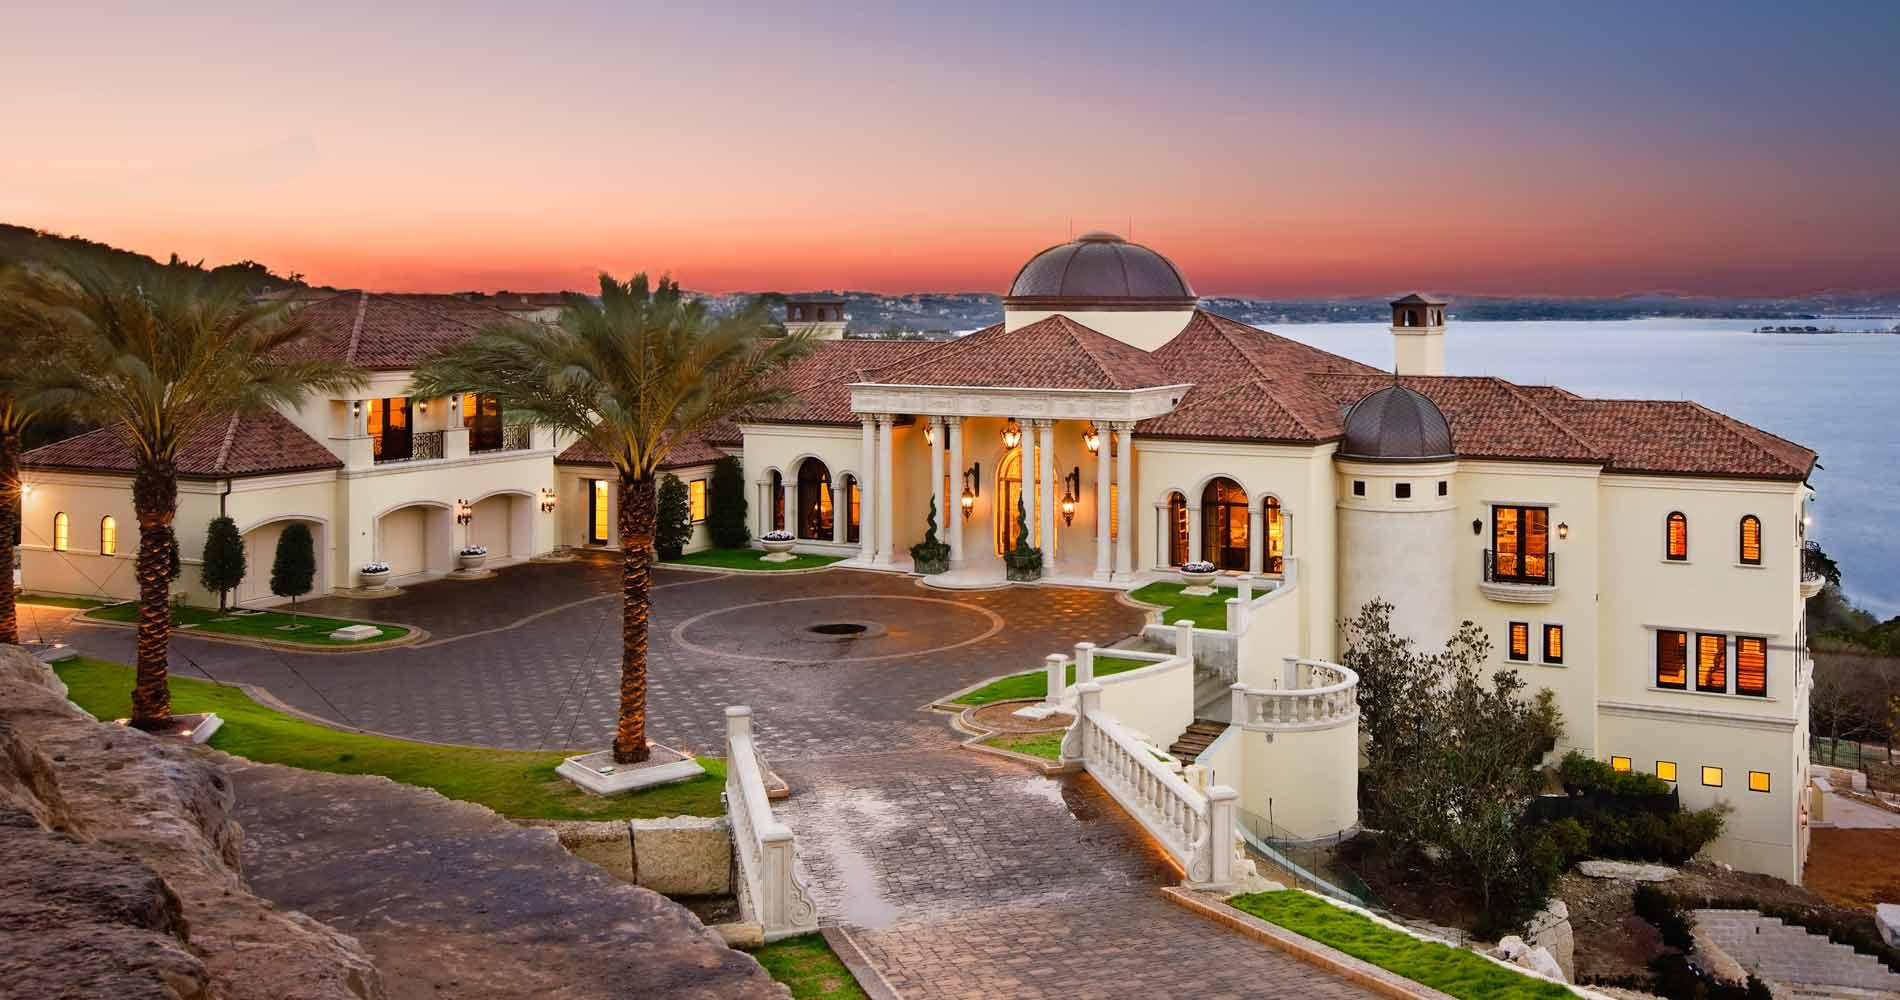 Italian Villa front view